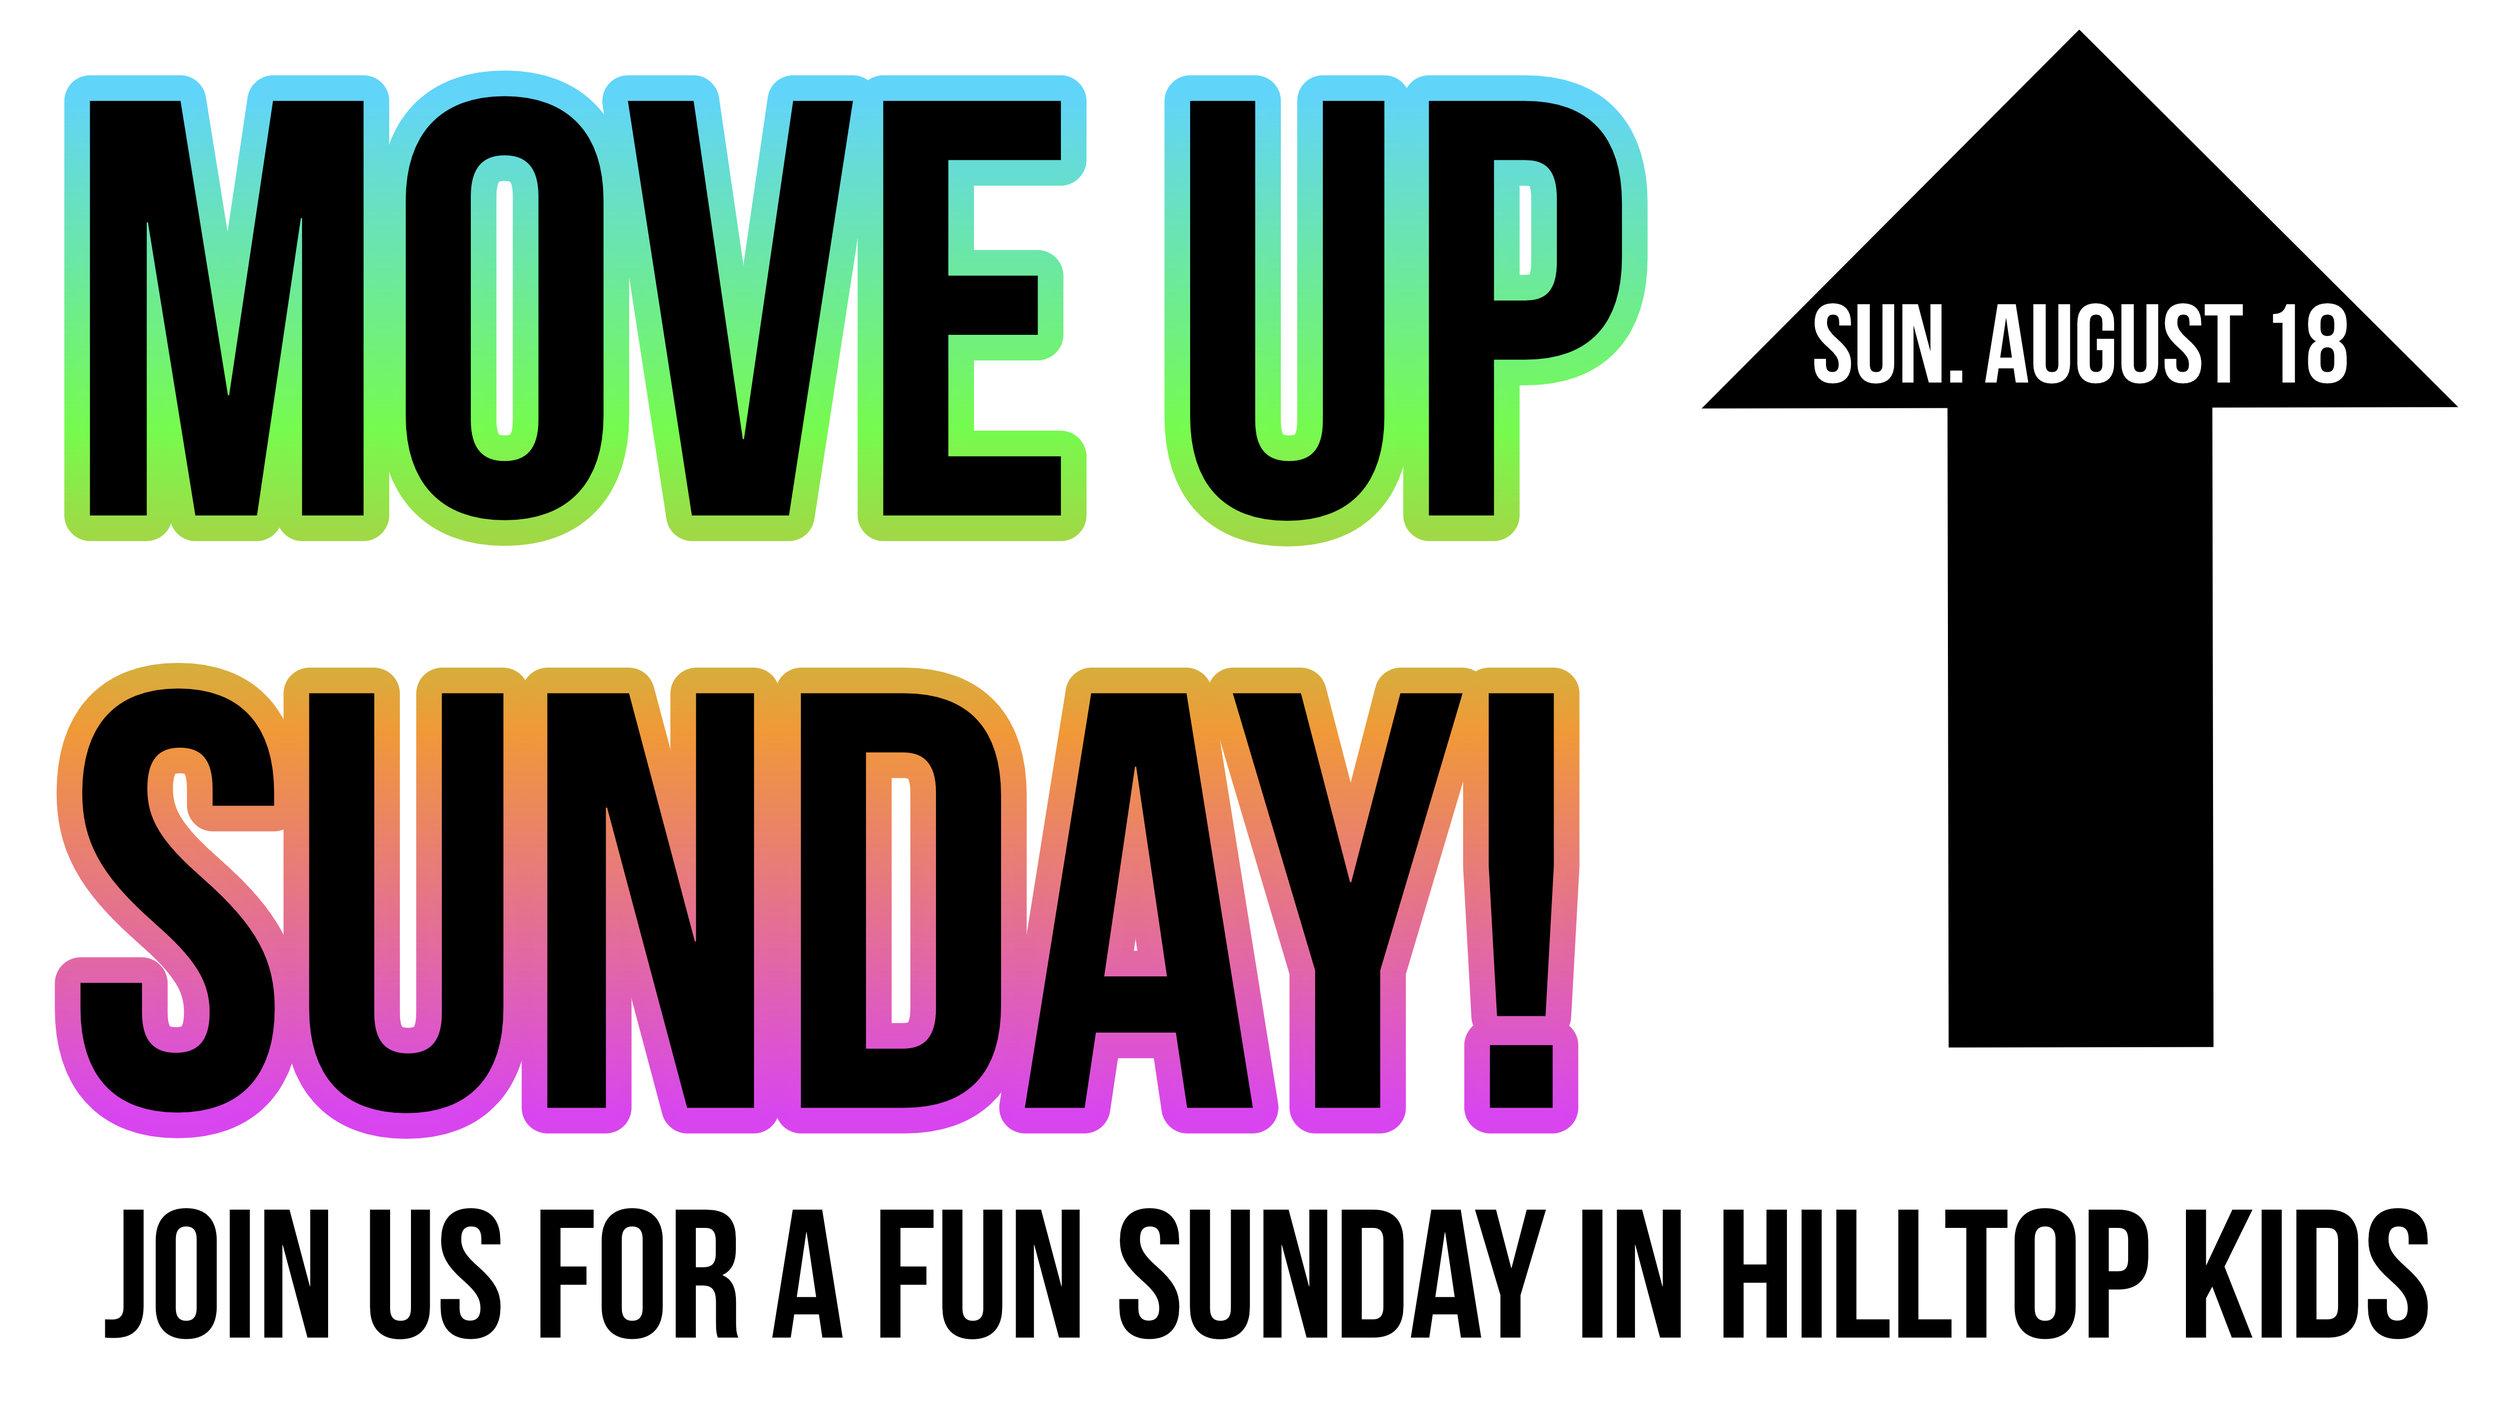 Move up Sunday.jpg